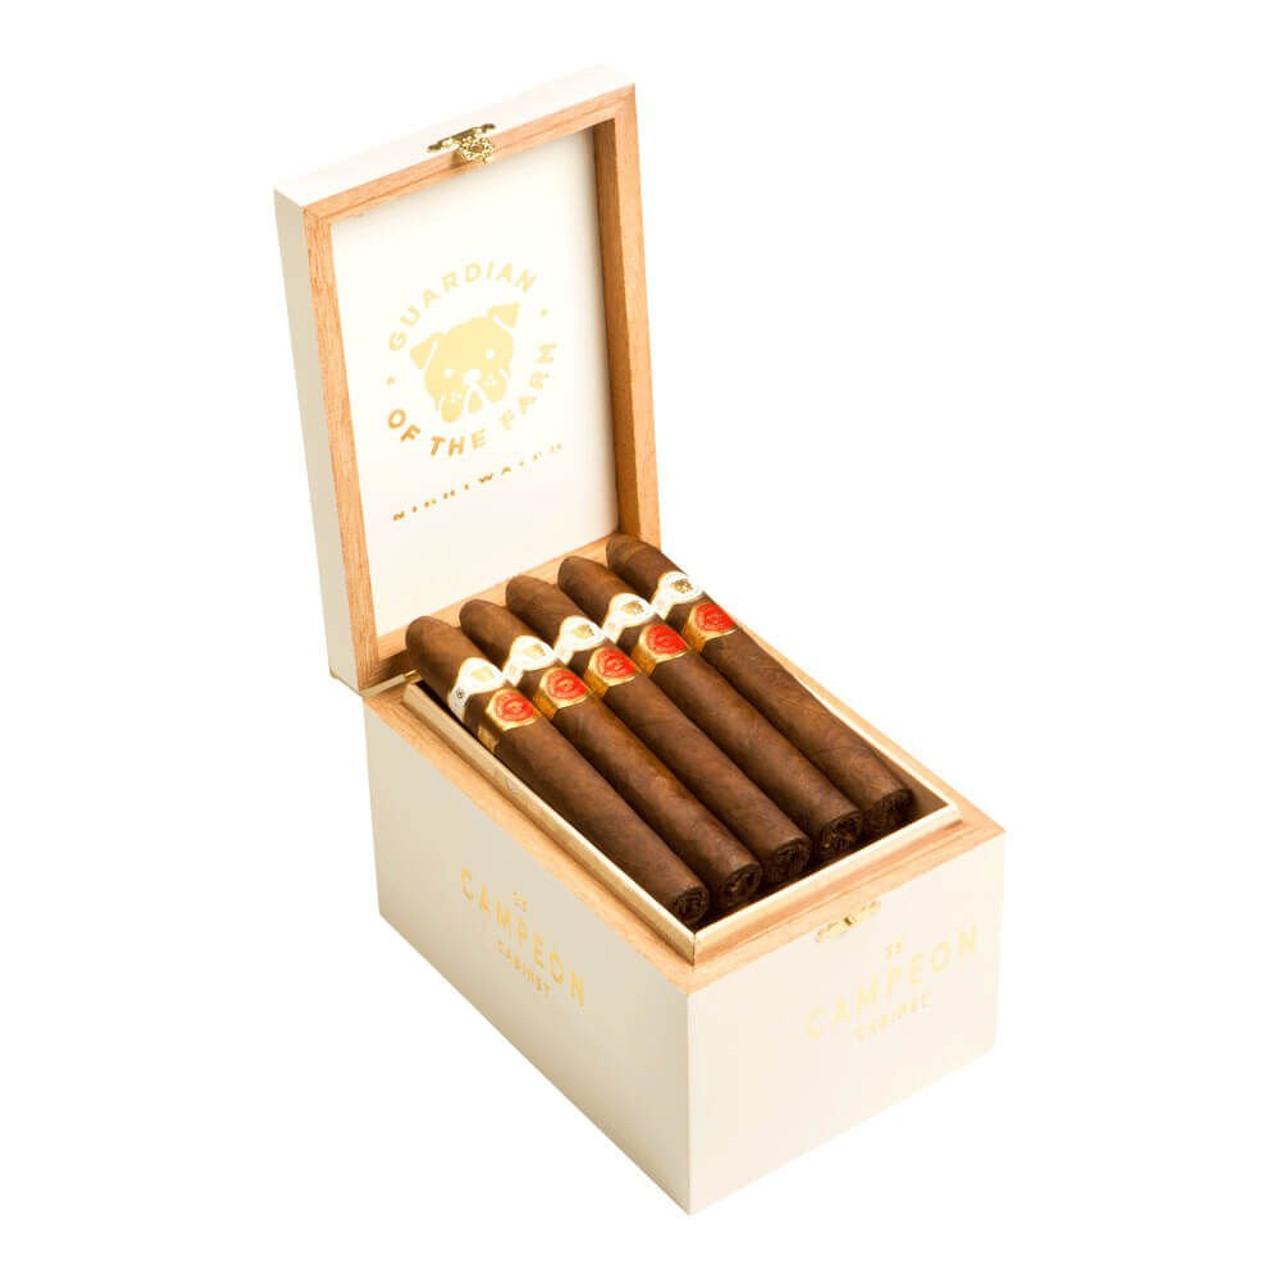 Casa Fernandez Guardian of The Farm Night Watch Orpheus Cigars - 6 x 44 (Box of 25)